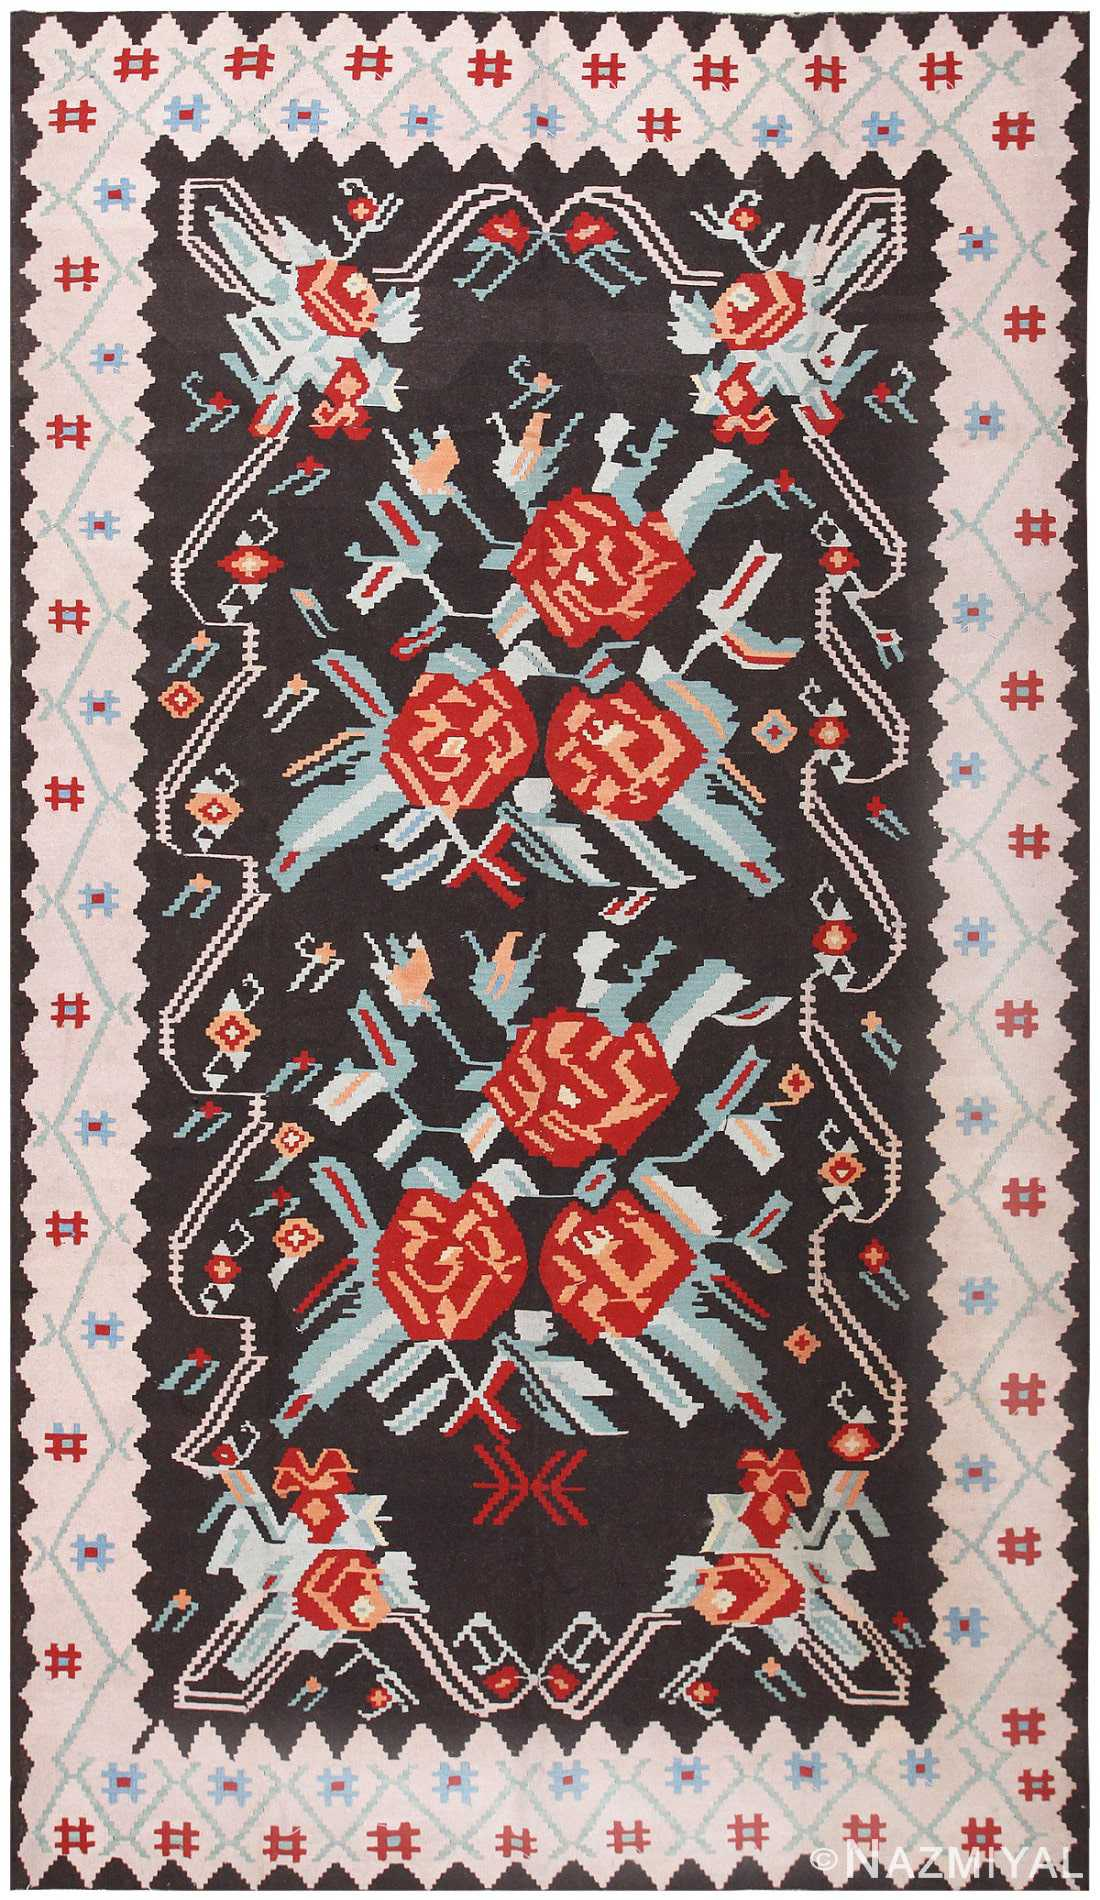 Antique Turkish Kilim 50170 Detail/Large View